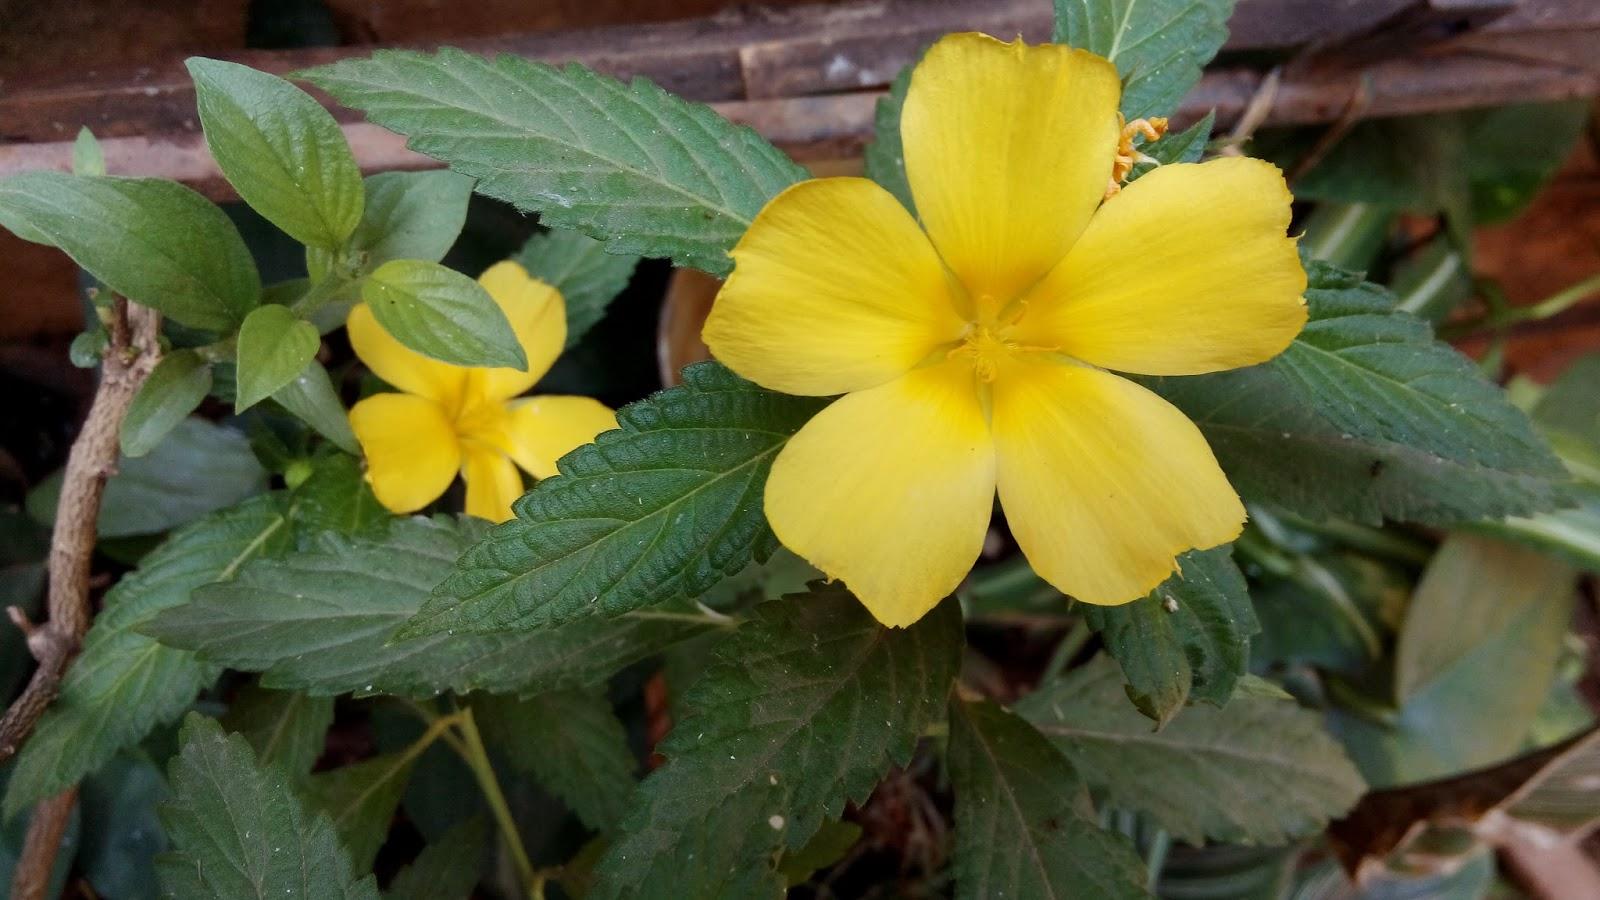 Garden Care Simplified Yellow Mussaenda Flowering Plant Growing